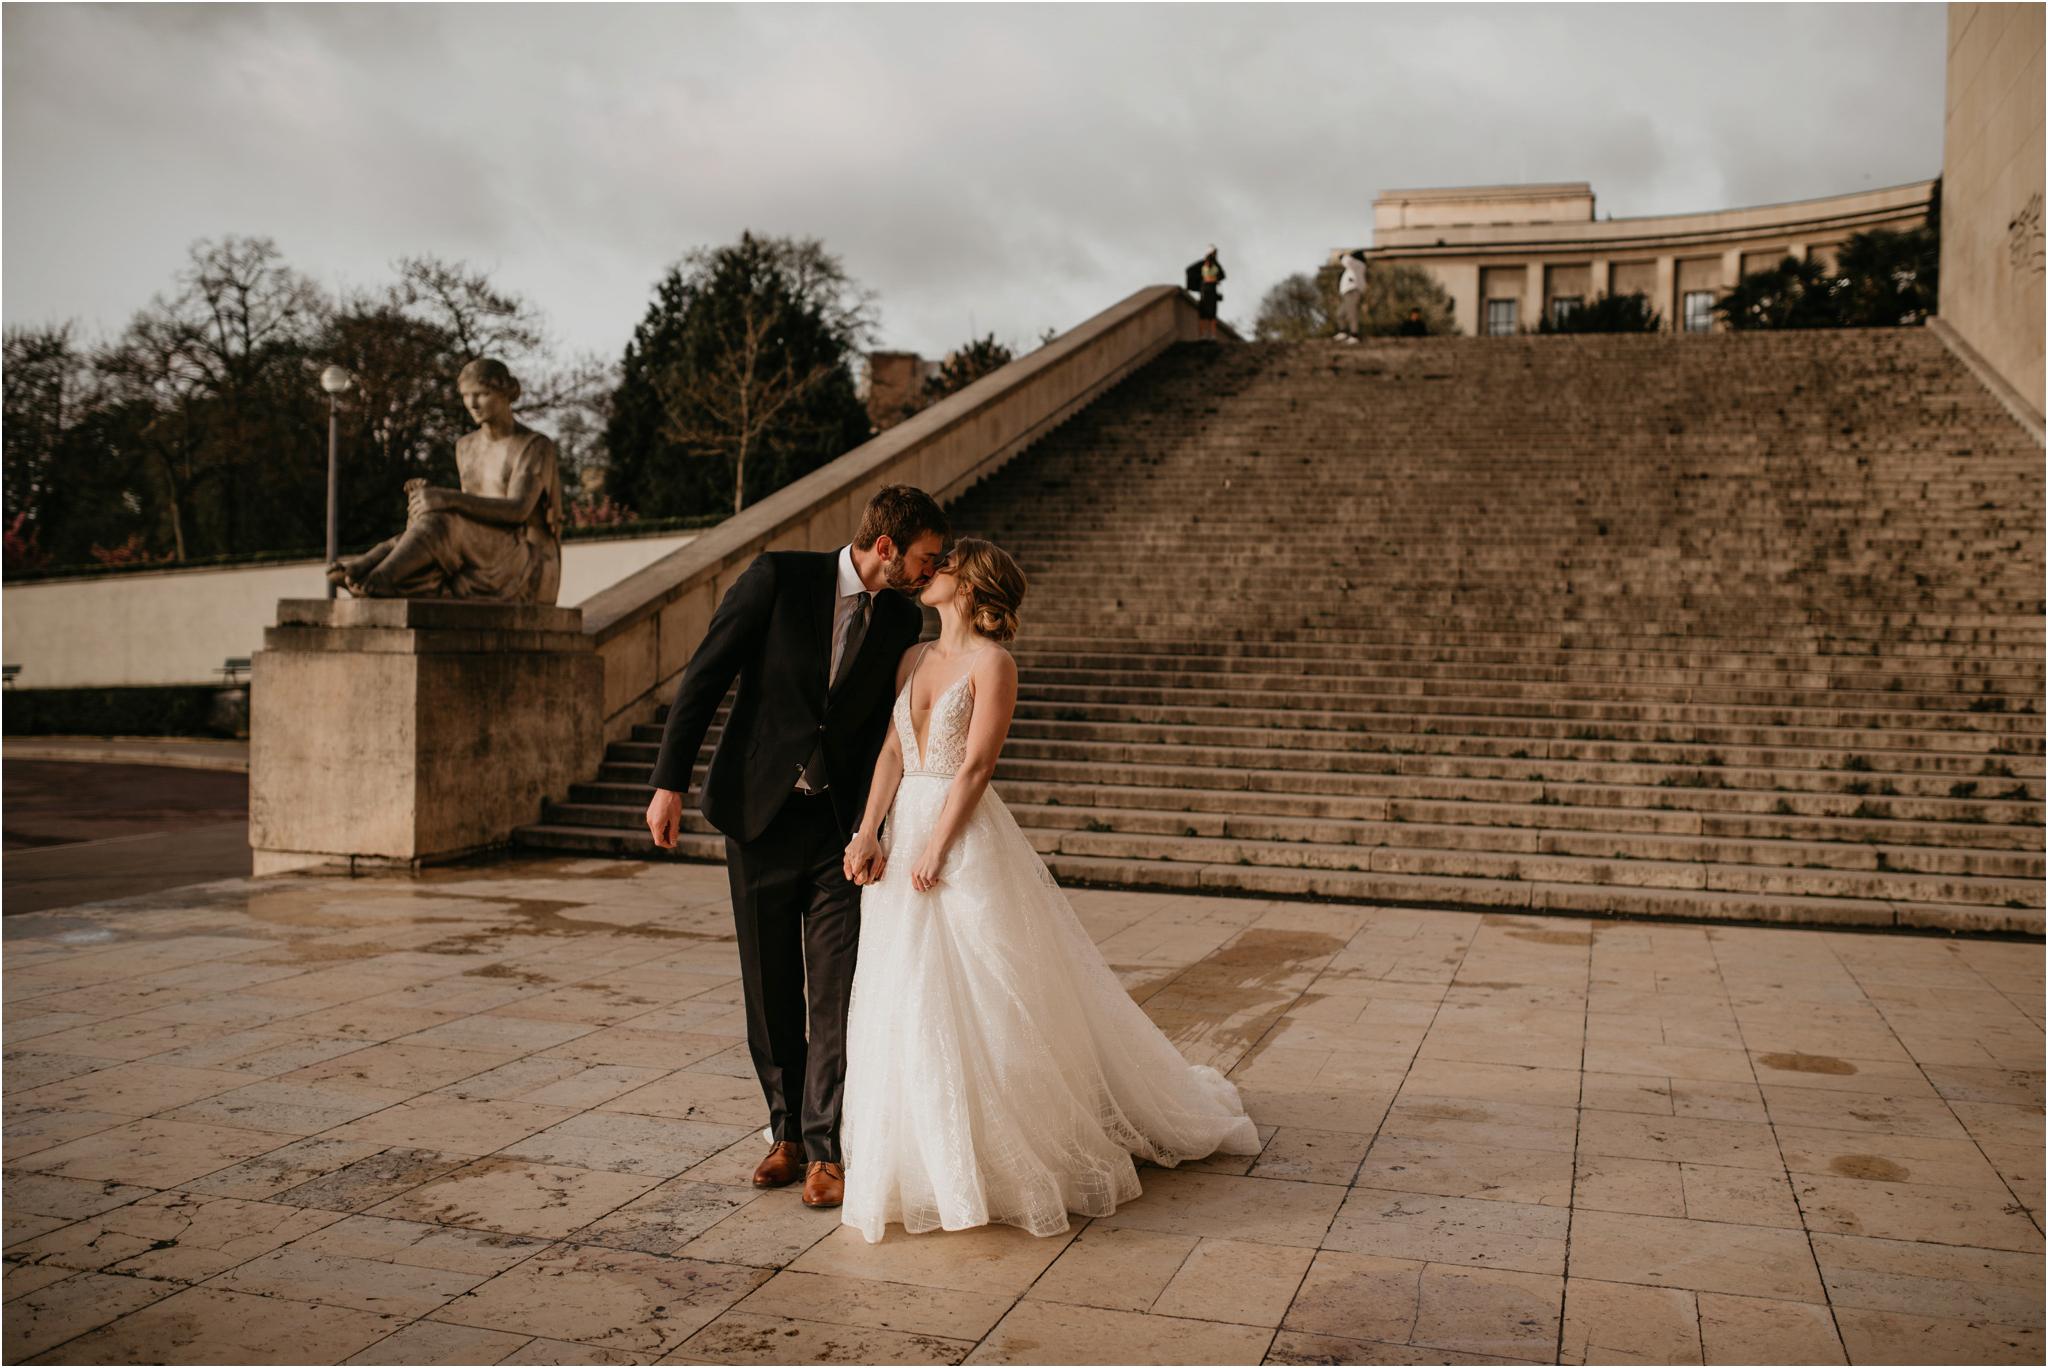 miranda-and-jared-paris-elopement-destination-wedding-photographer-074.jpg